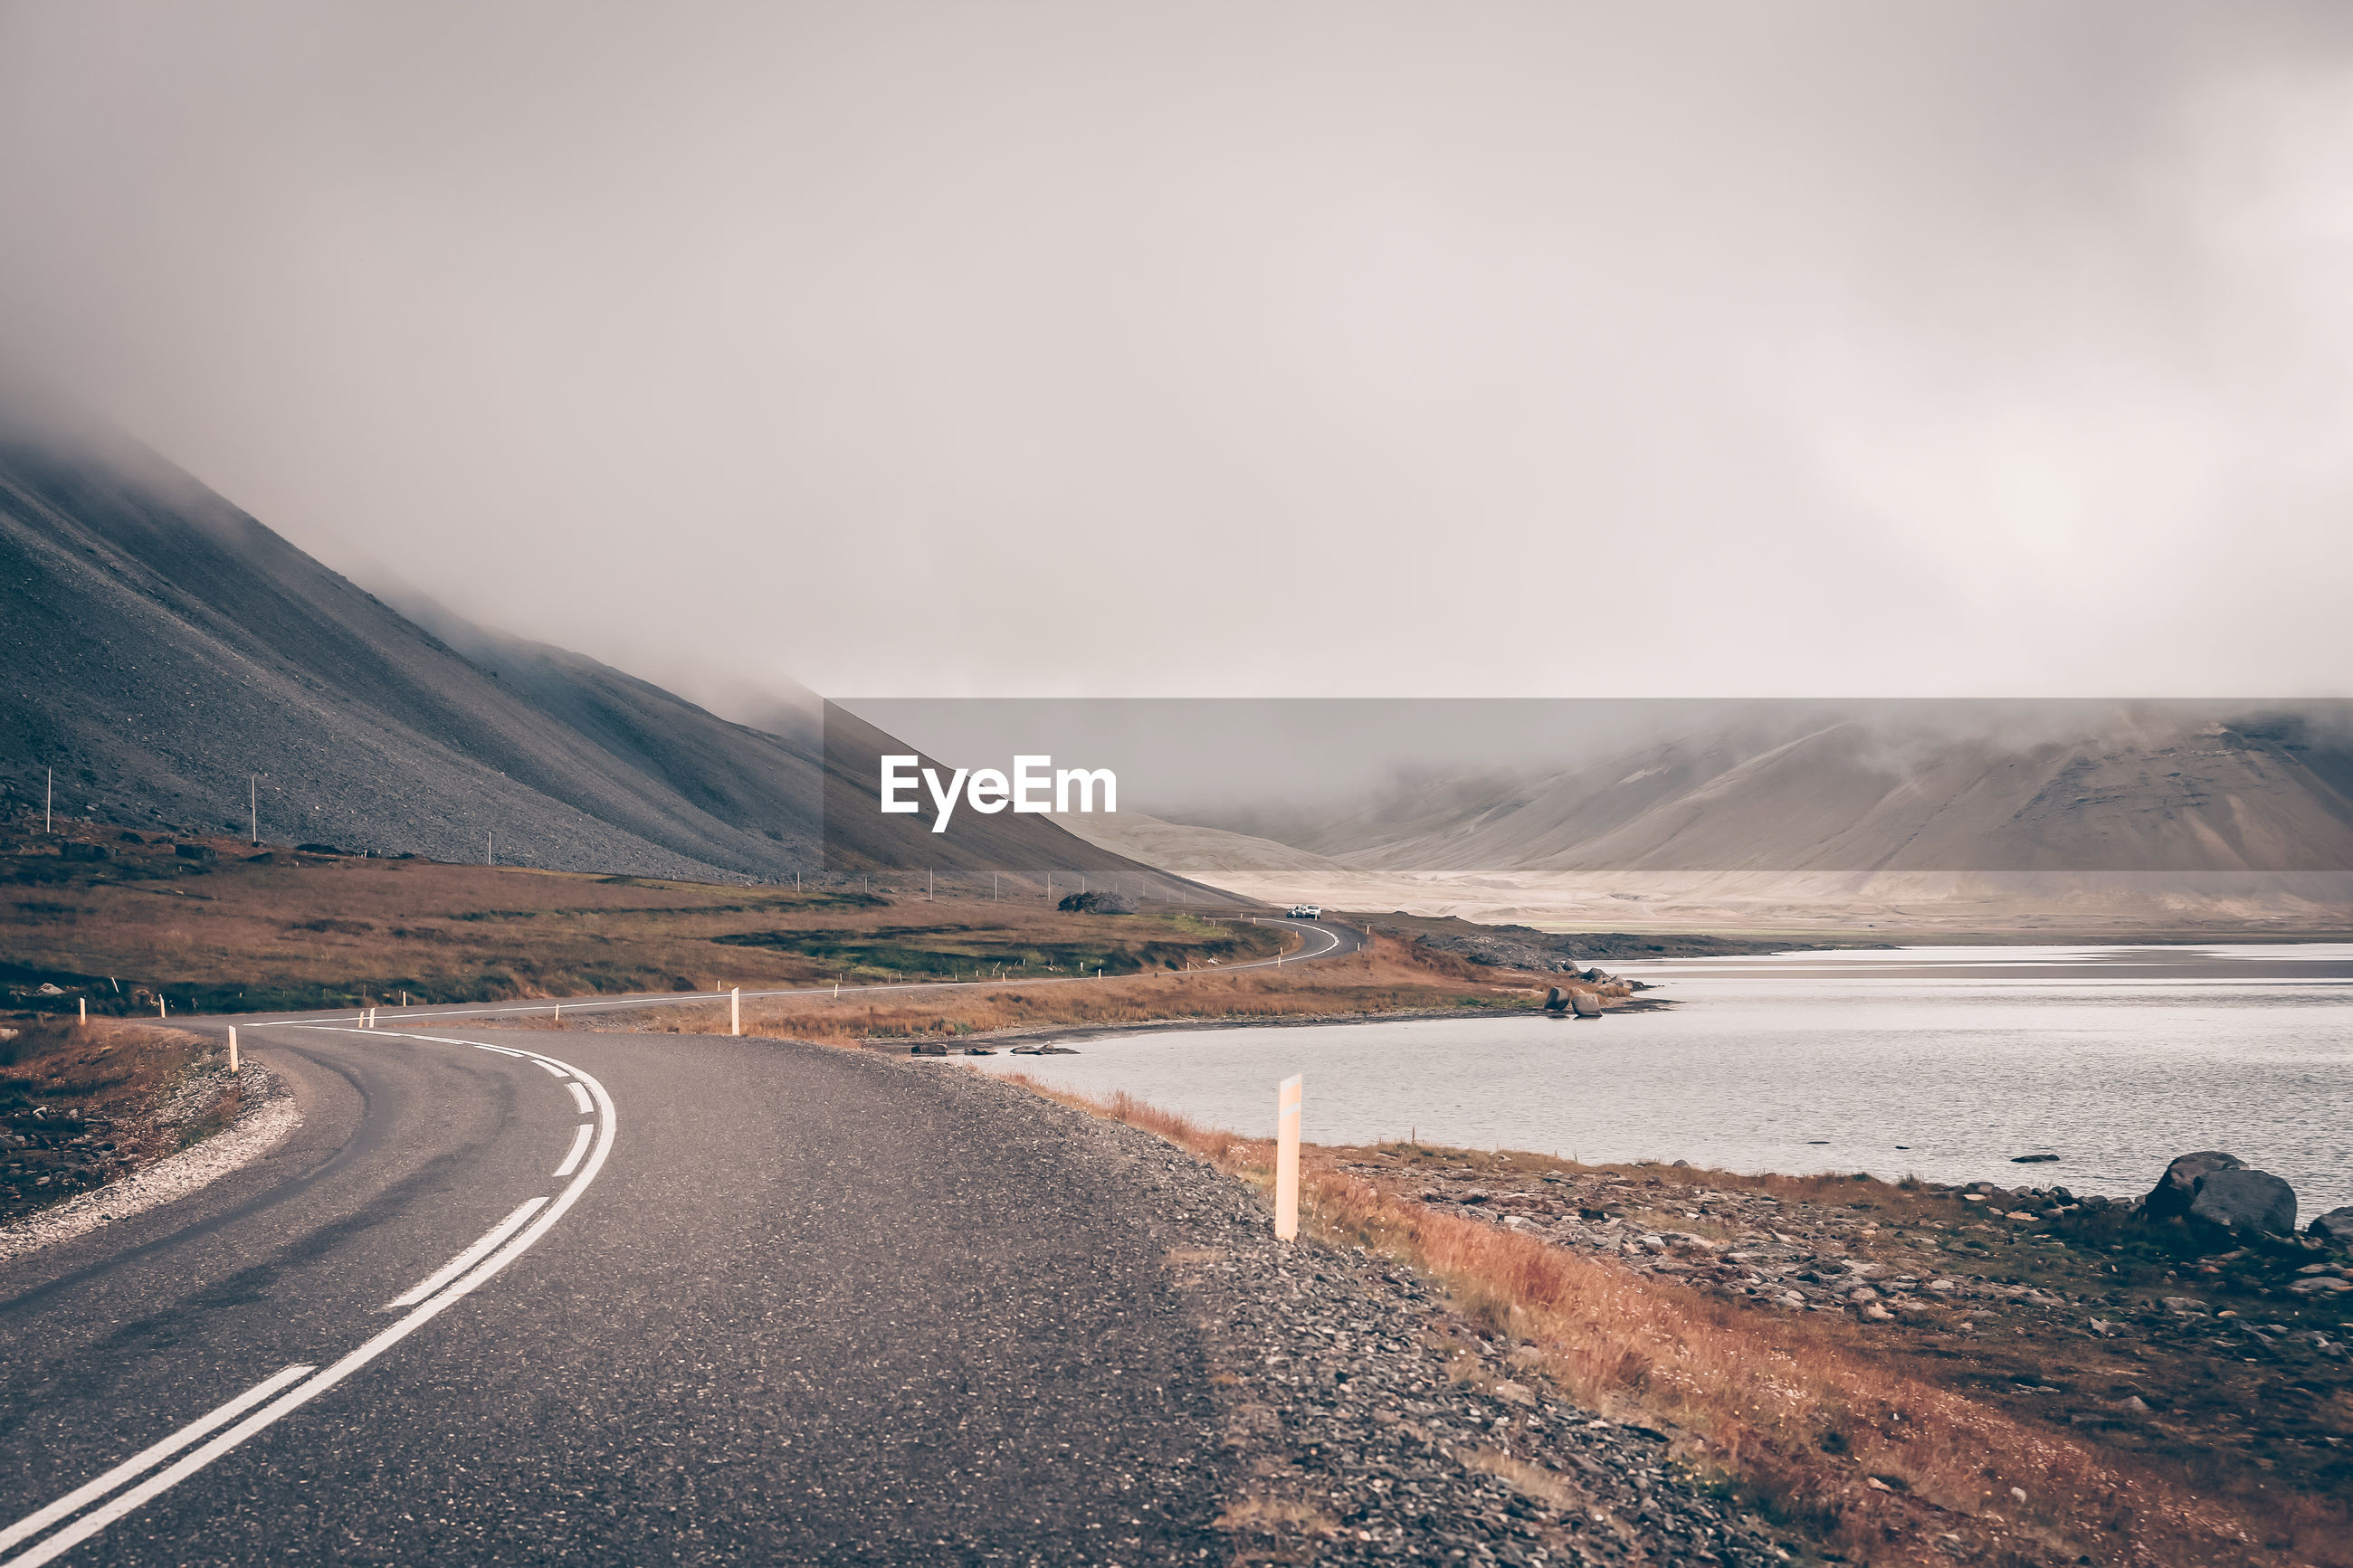 Road by lake against sky